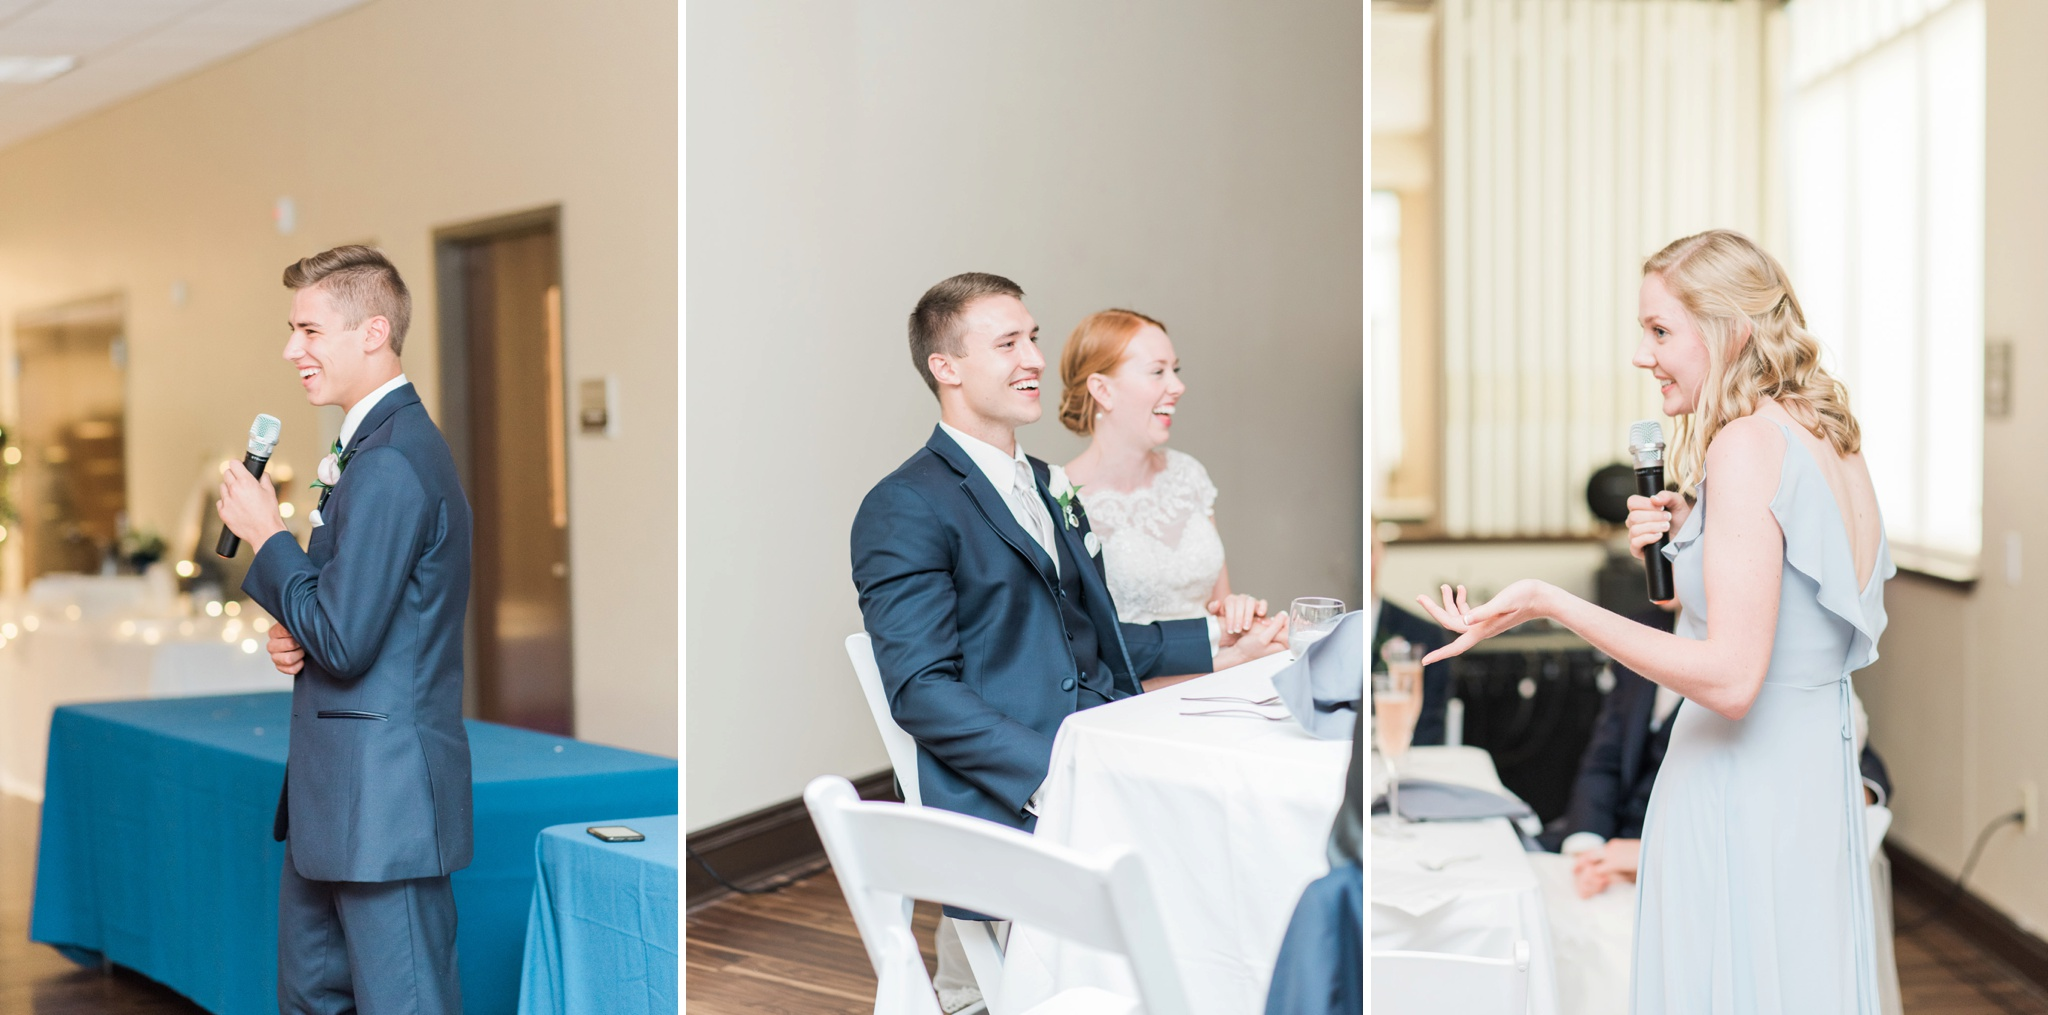 sunbury-ohio-wedding-hannah-johnathan_0131.jpg